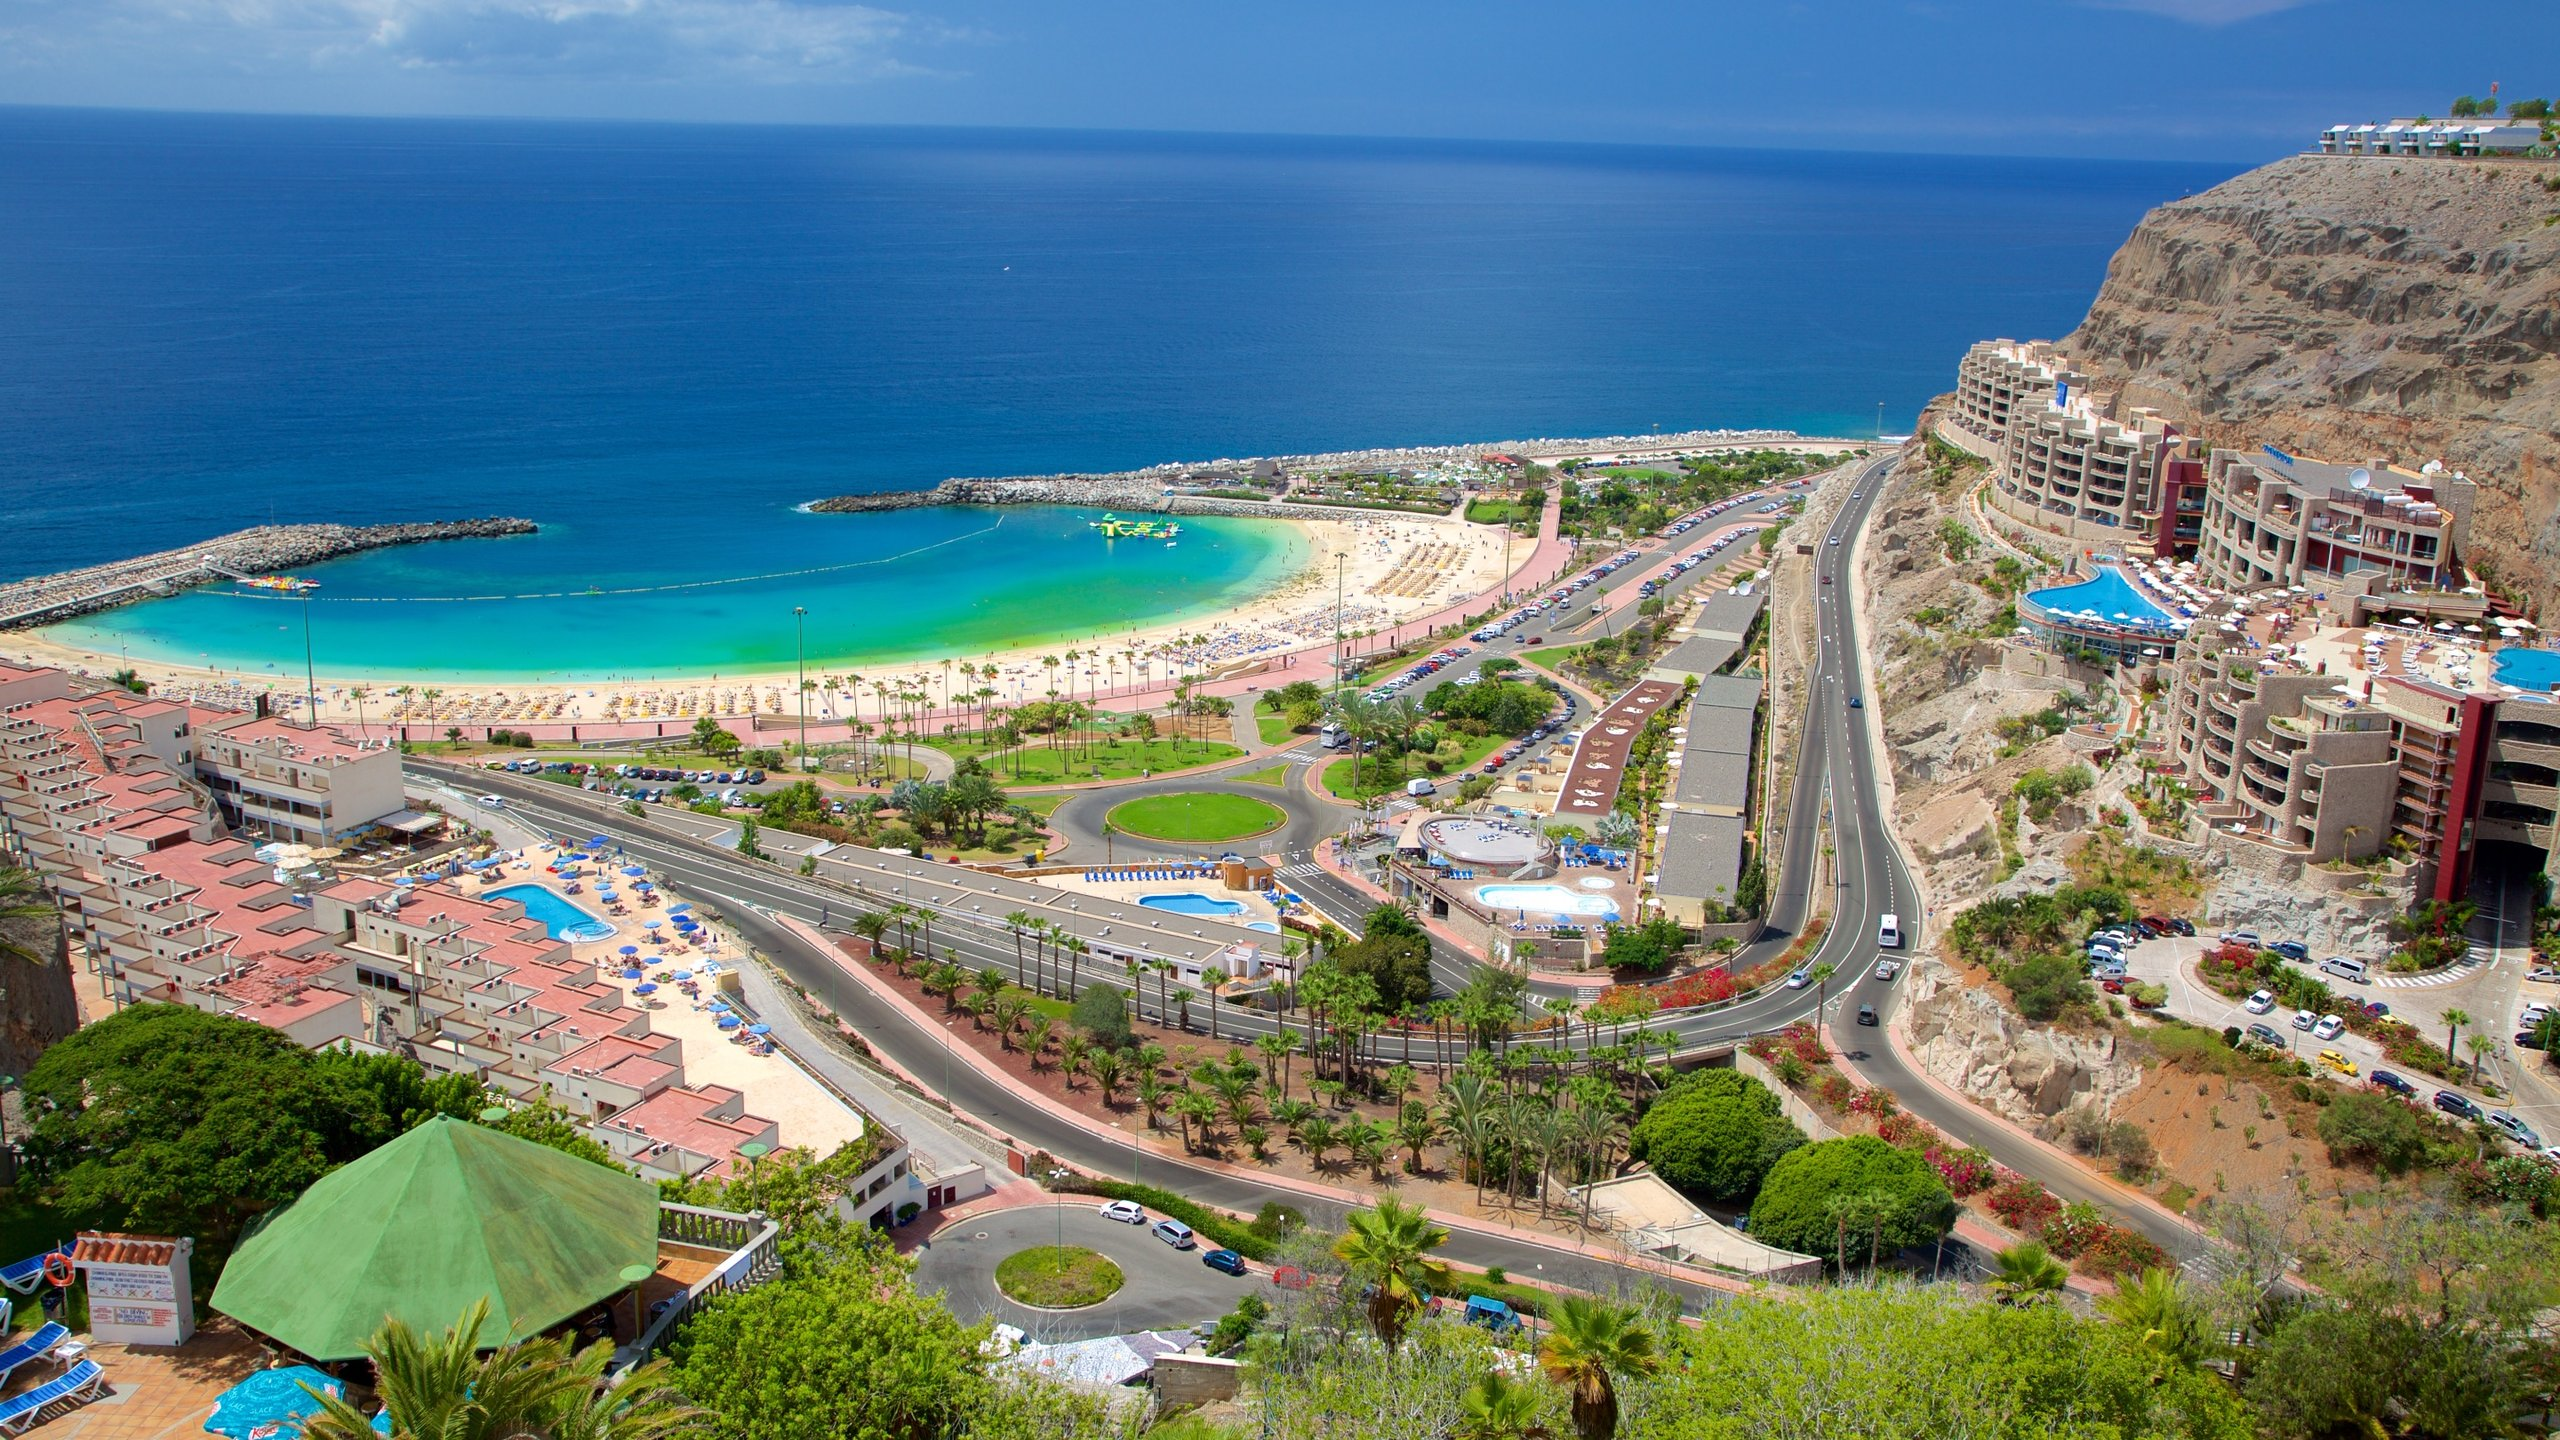 Free Download The 10 Best Hotels In Las Palmas De Gran